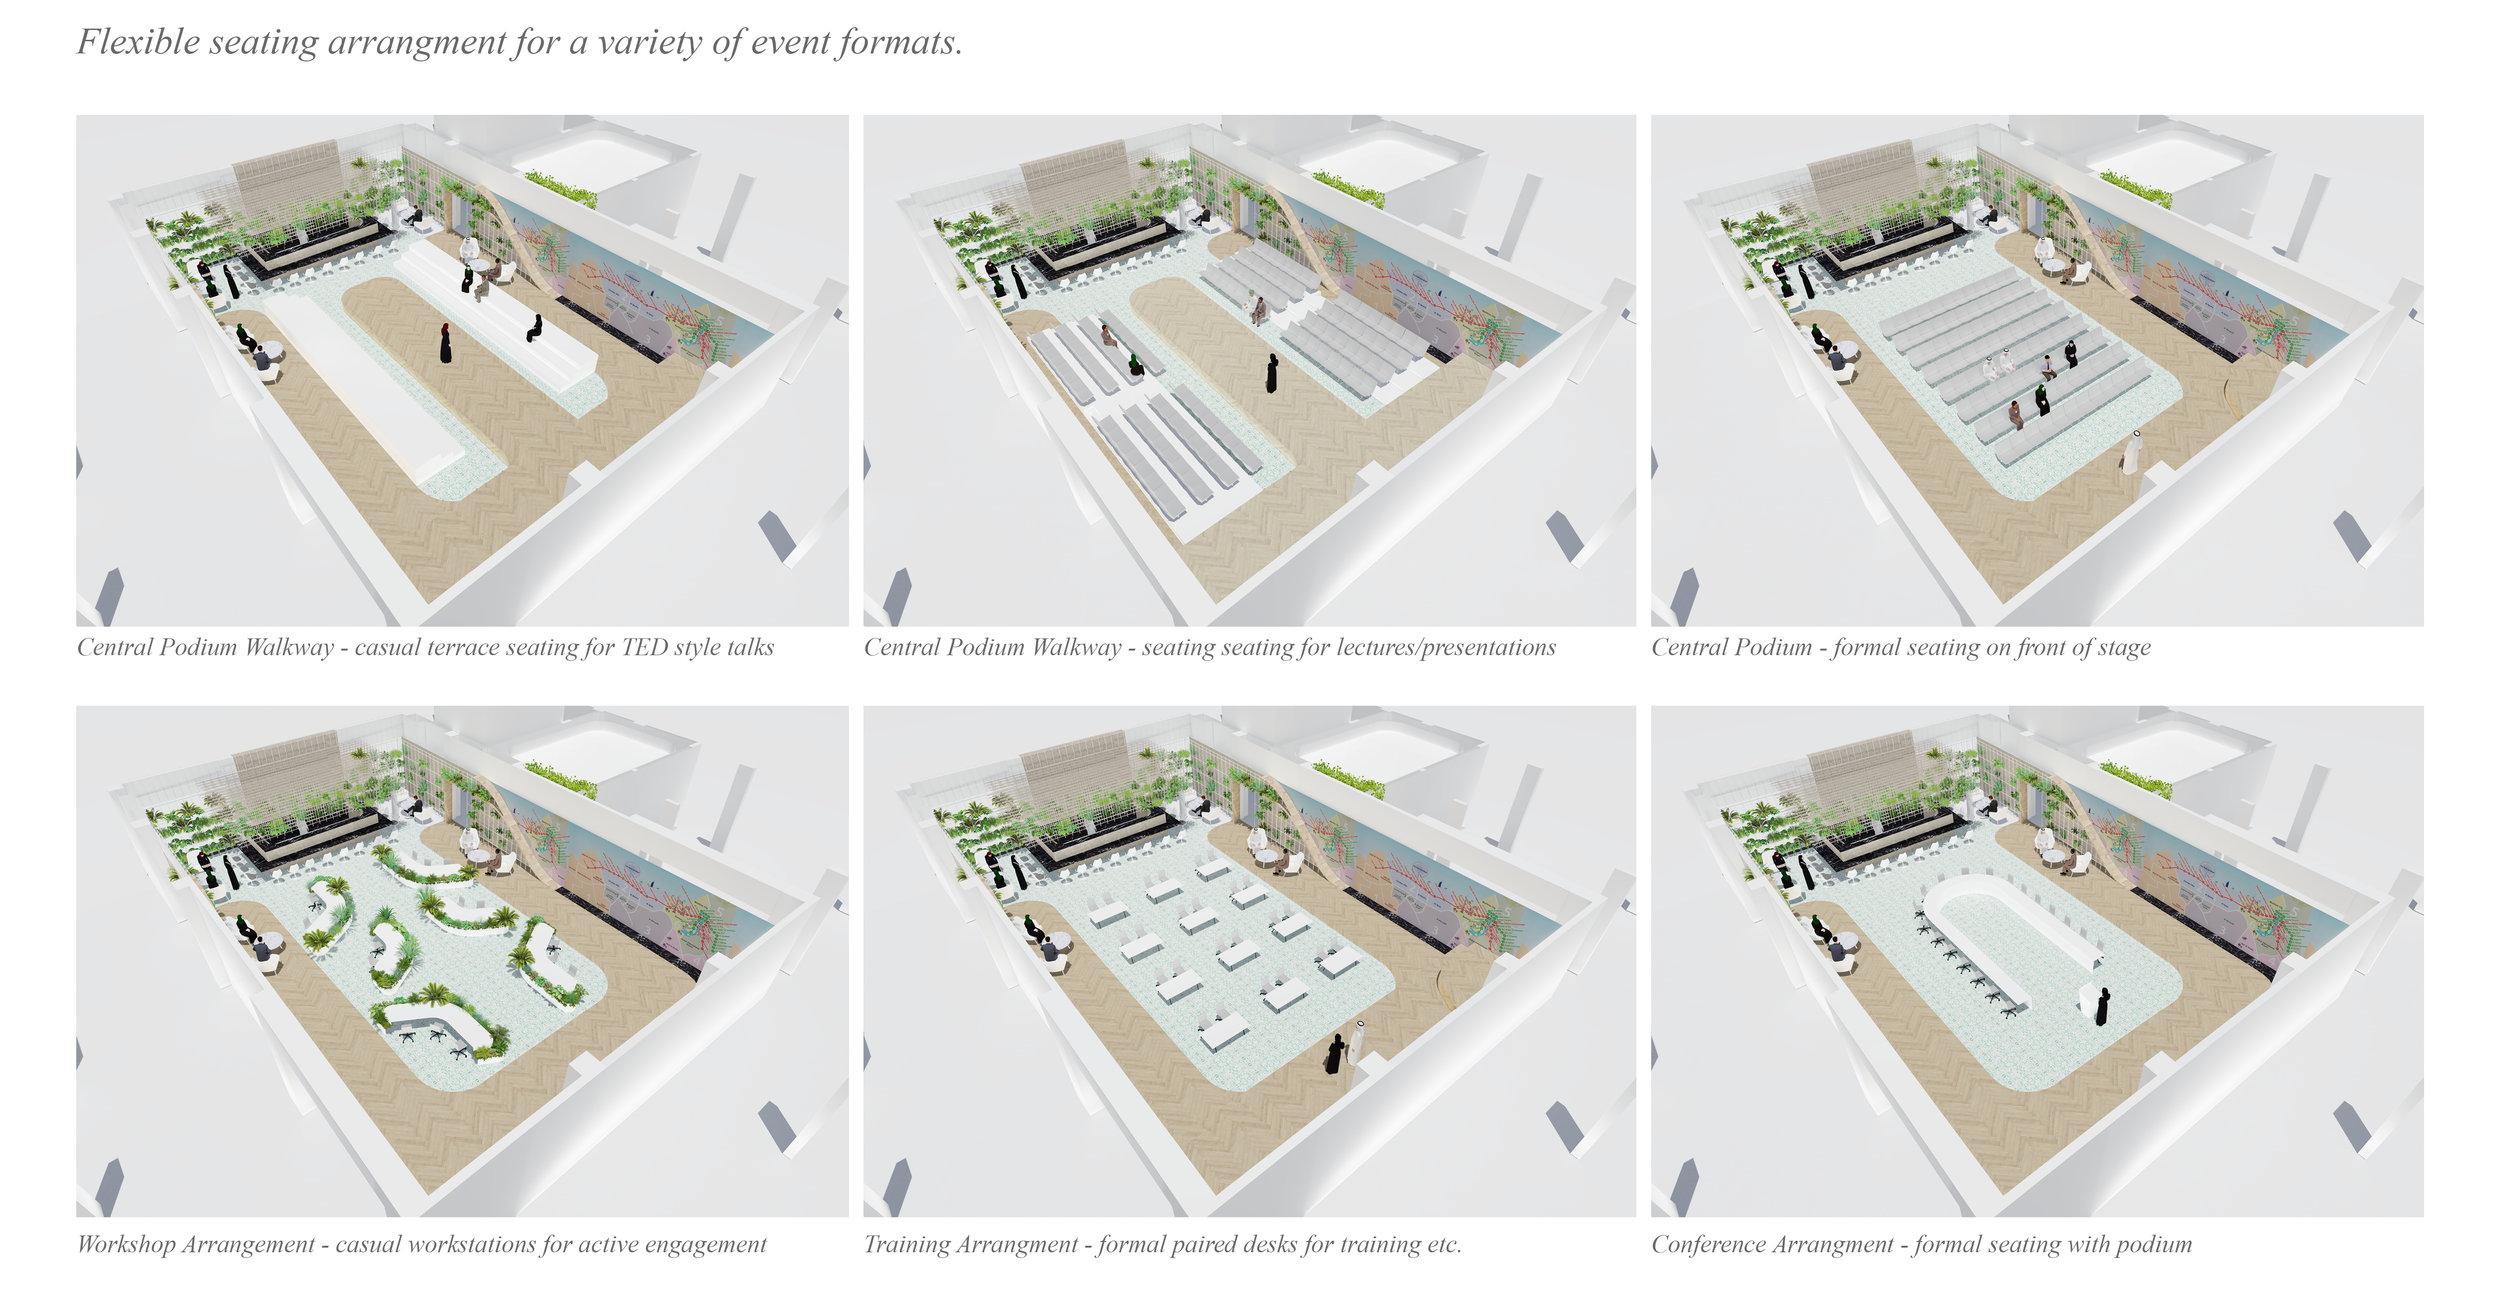 © Copyright Studio DS 2018 - the Dubai Police Innovation Hub Interior Design Layouts